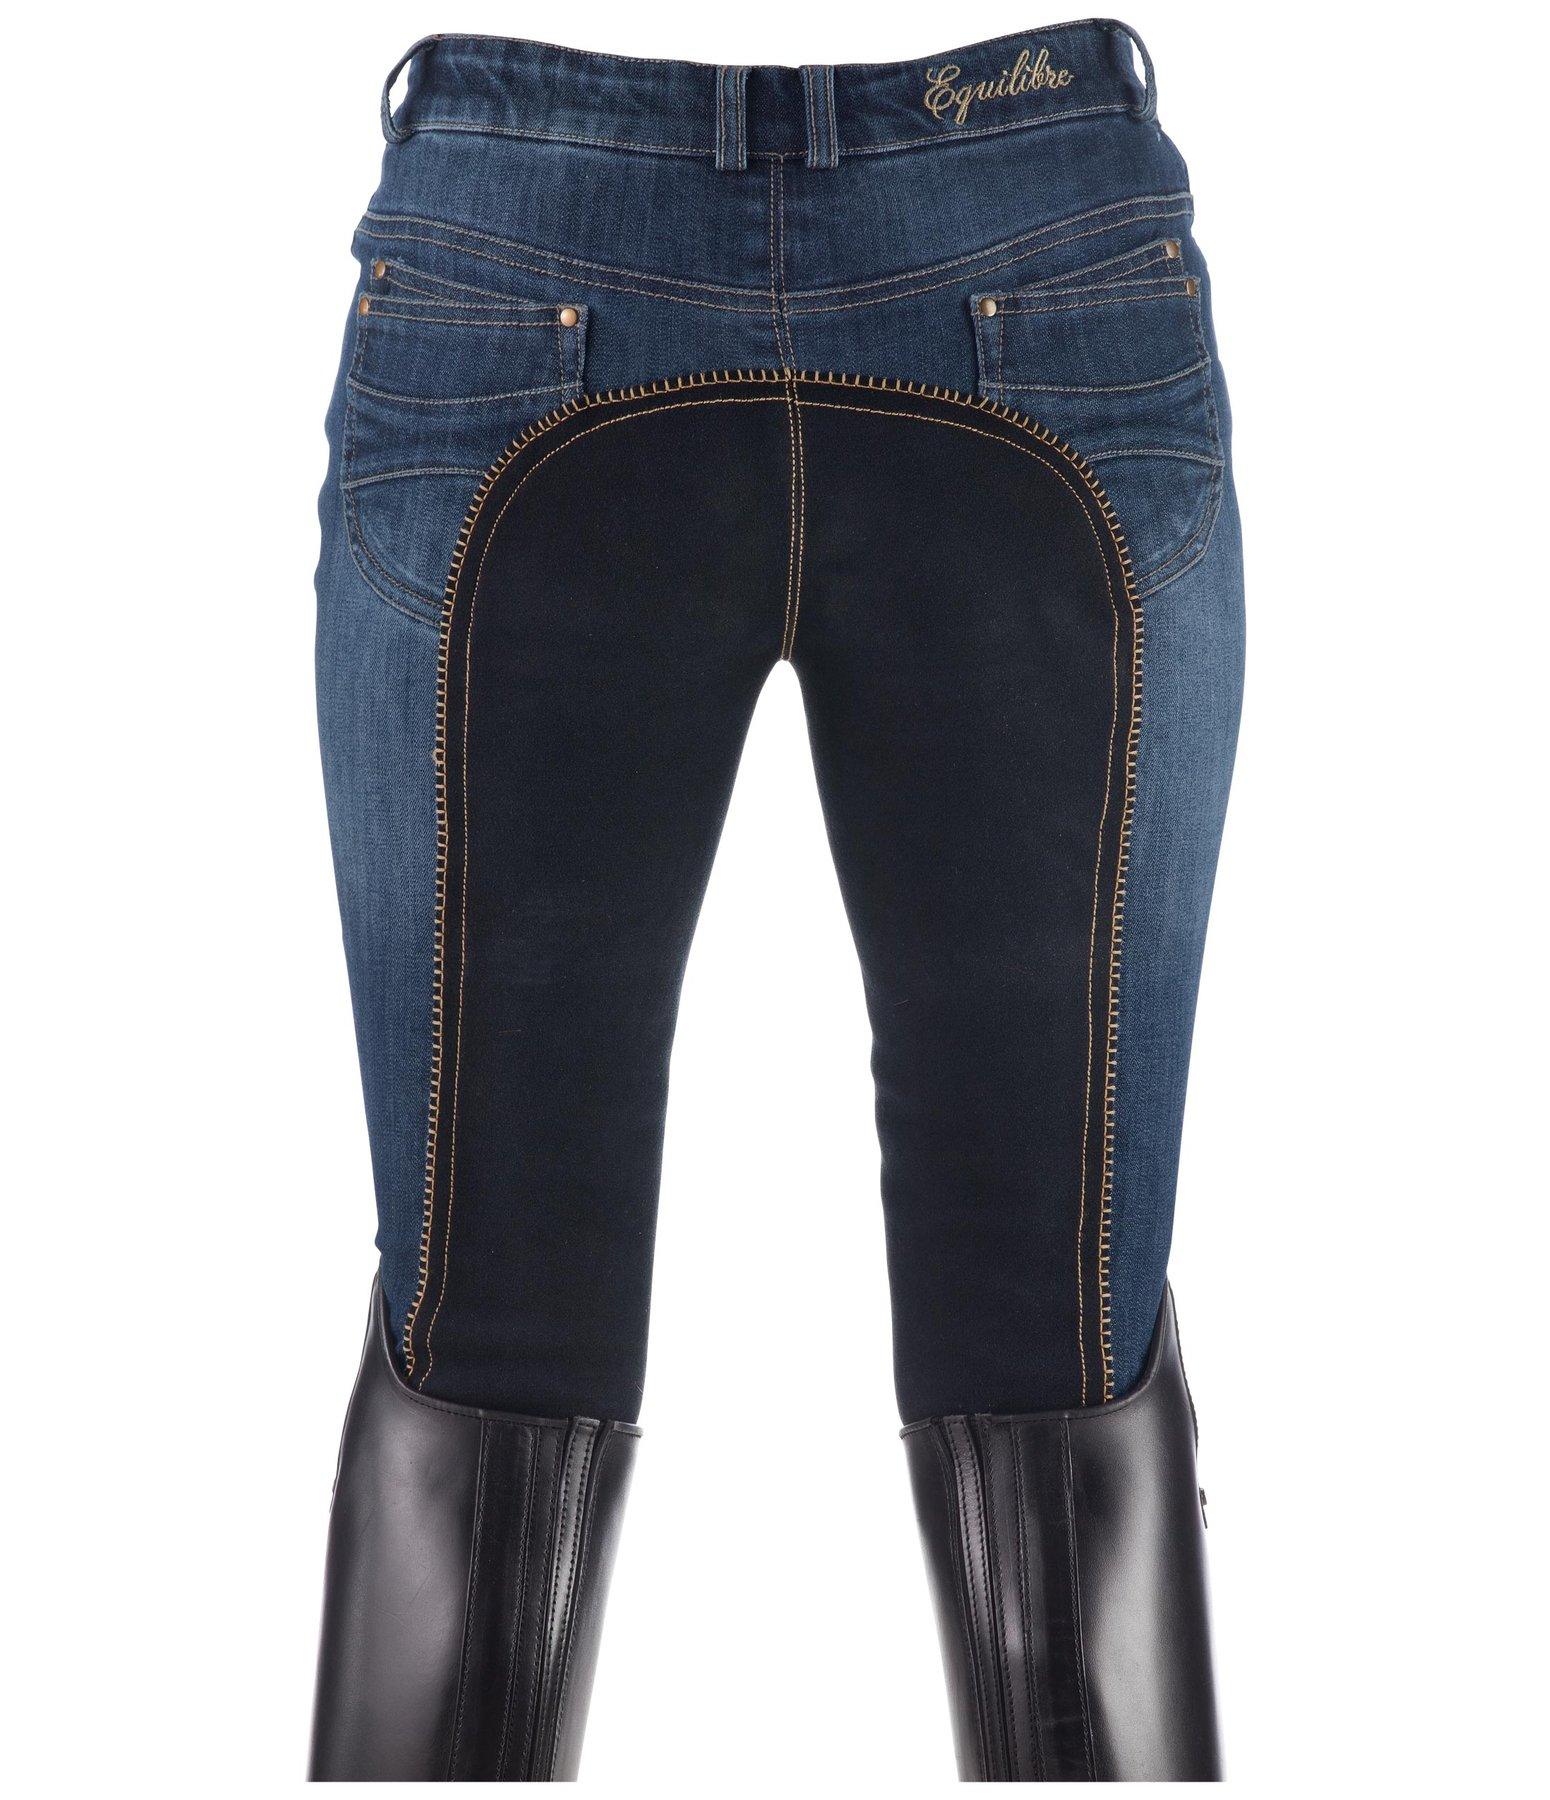 Kinder Reithose Jeans Vollbesatz CARA ELT jeansblau//nachtblau NEU